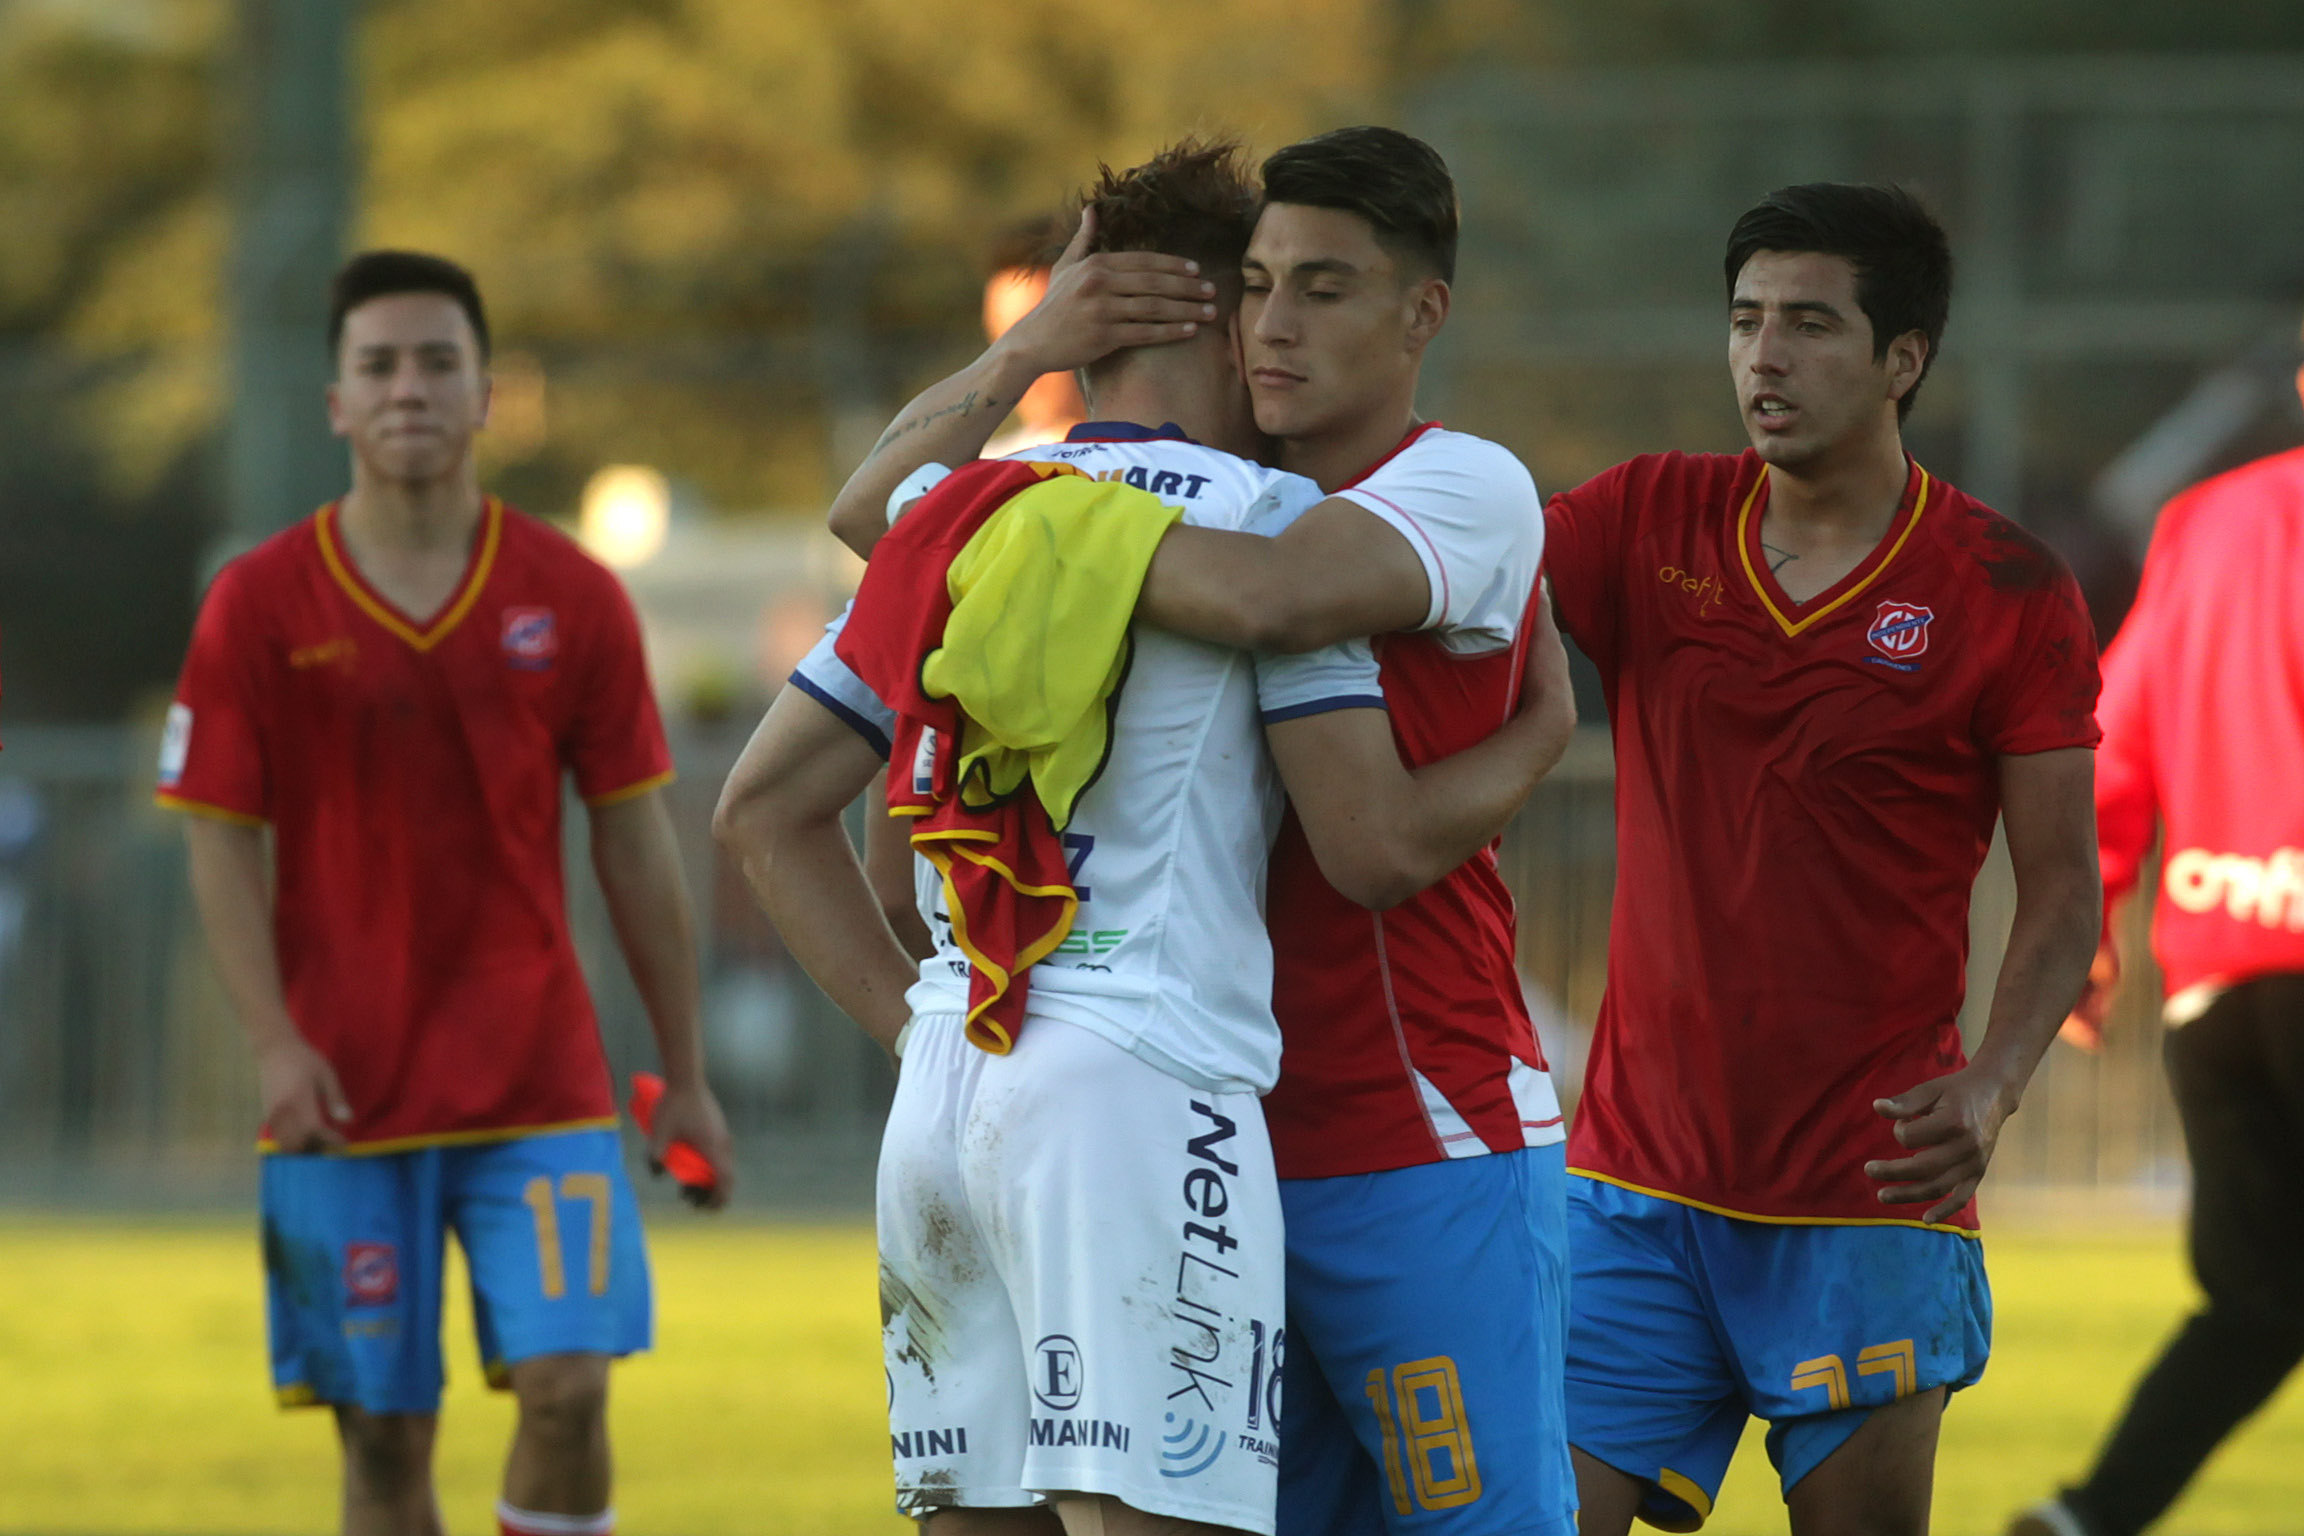 Melipilla 3-3 Independiente de Cauquenes